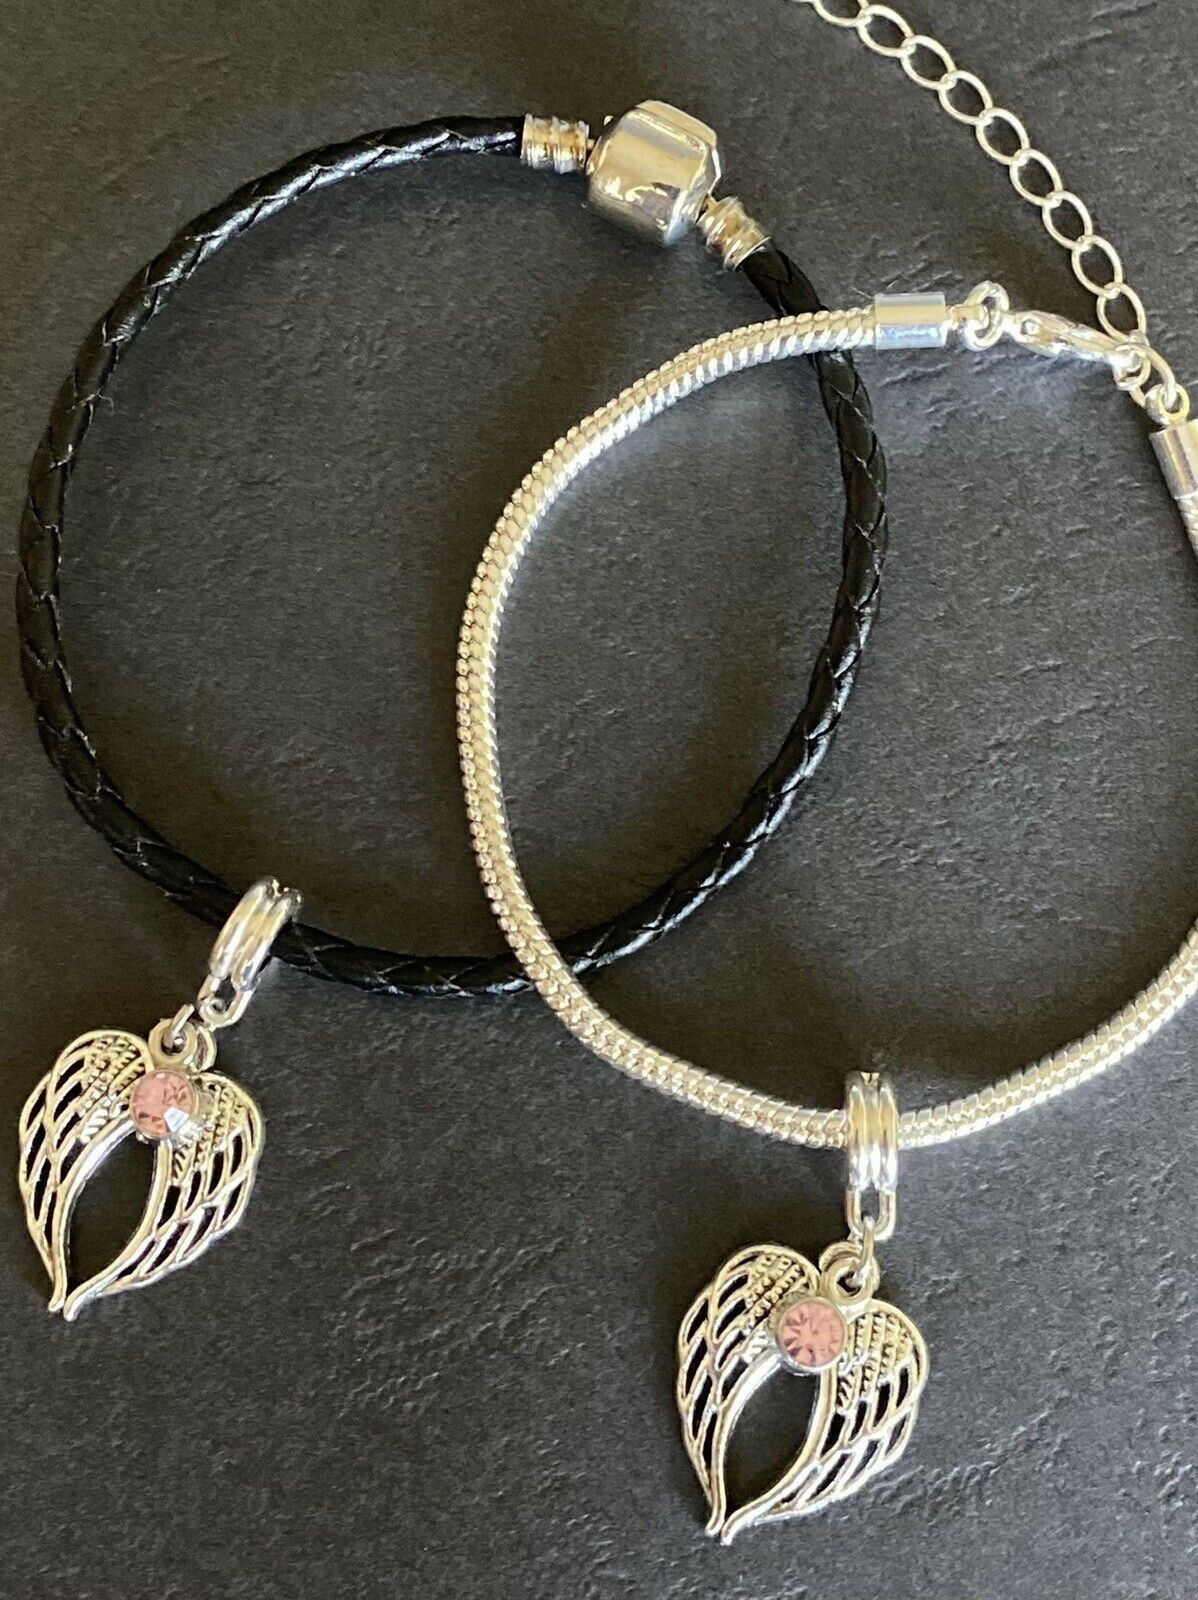 'In Memory Of' Angel Wings Bracelet. Memorial, Remembrance Gift